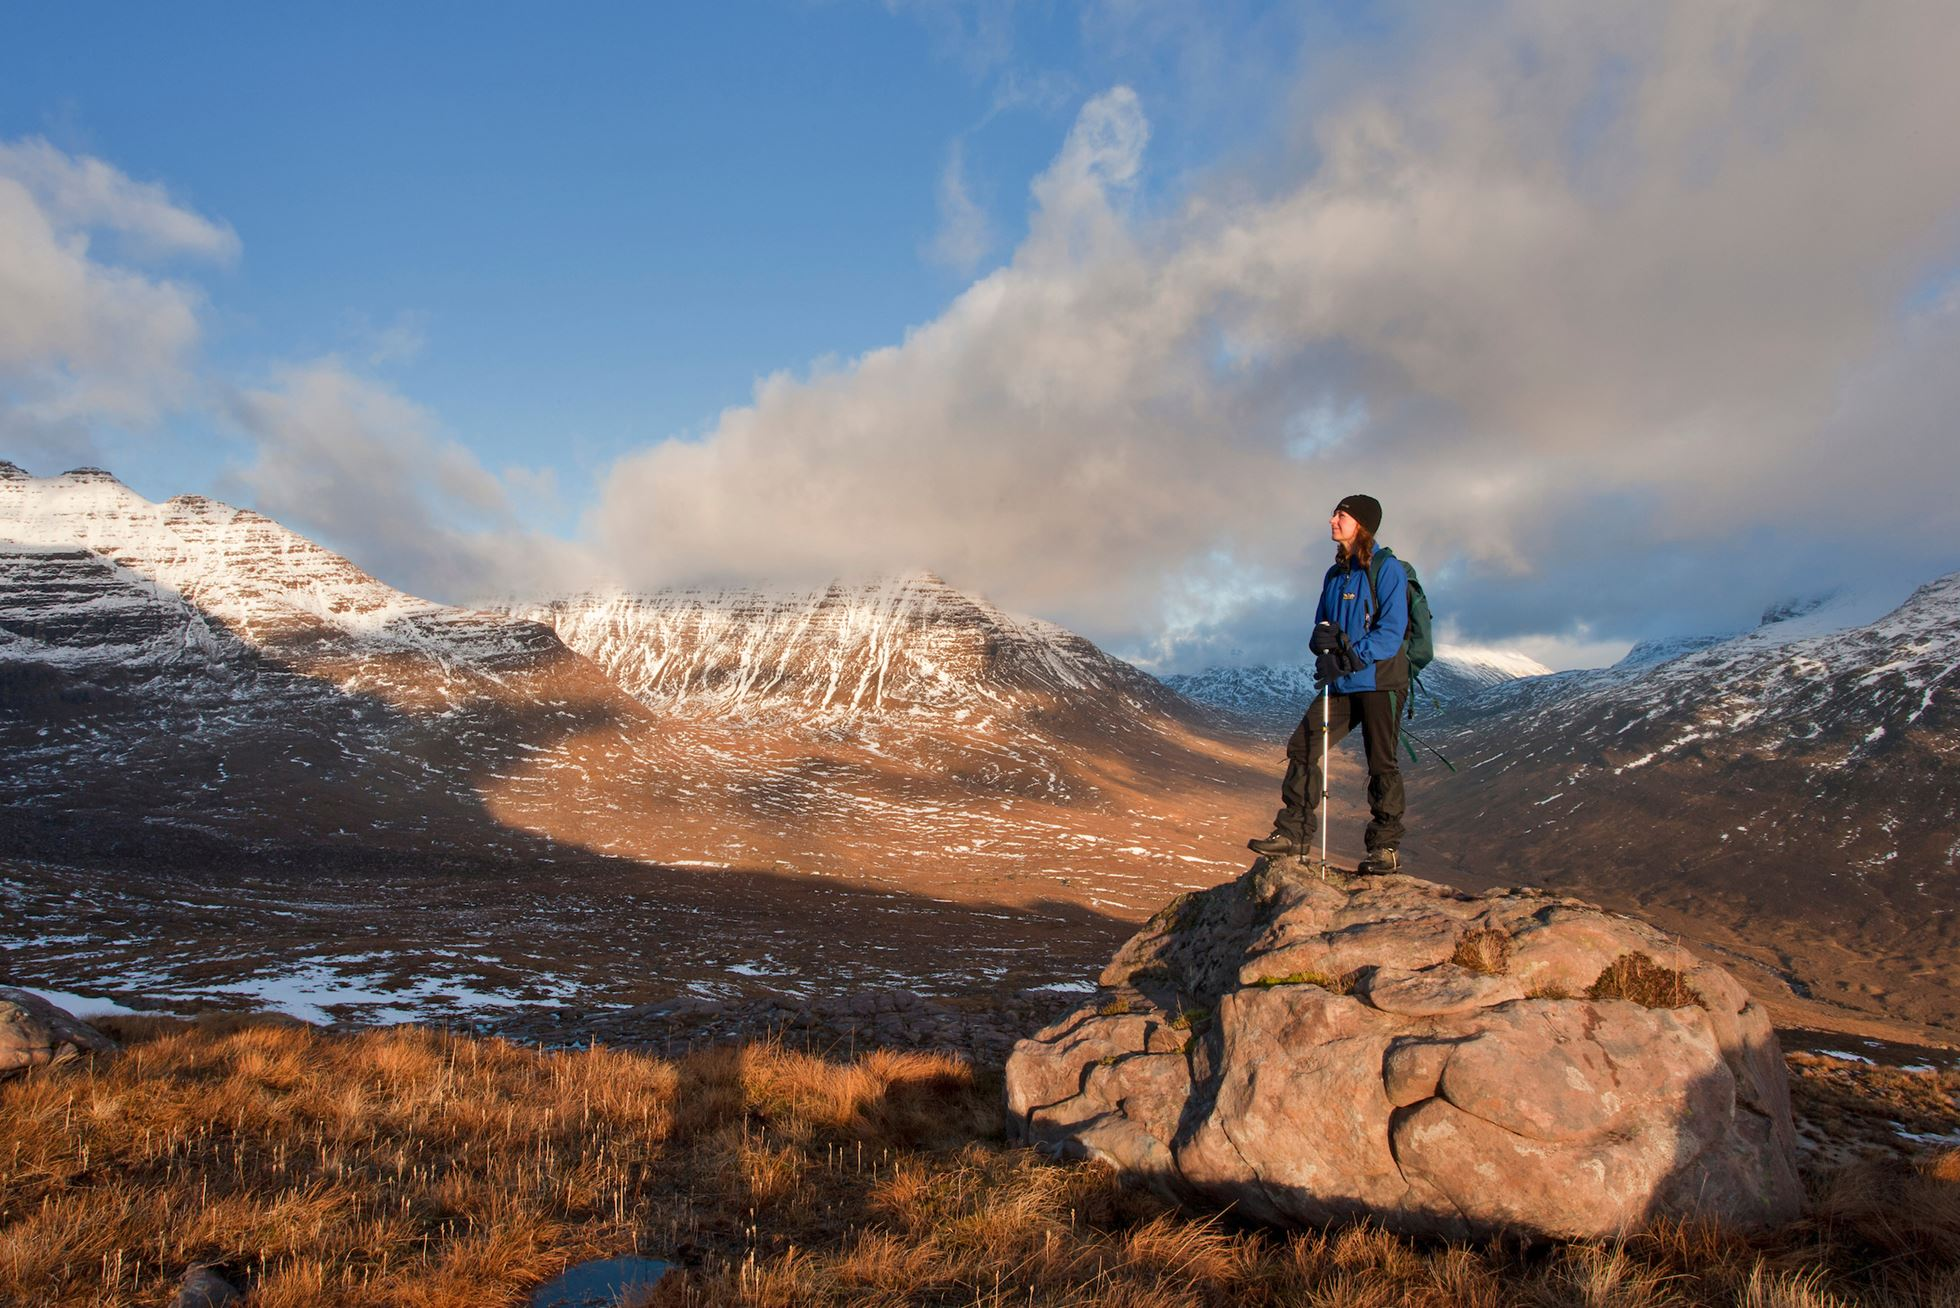 Woman (aged 40) on rock admiring the view on the route up Tom na Gruagaich, Beinn Alligin, Torridon, Scotland